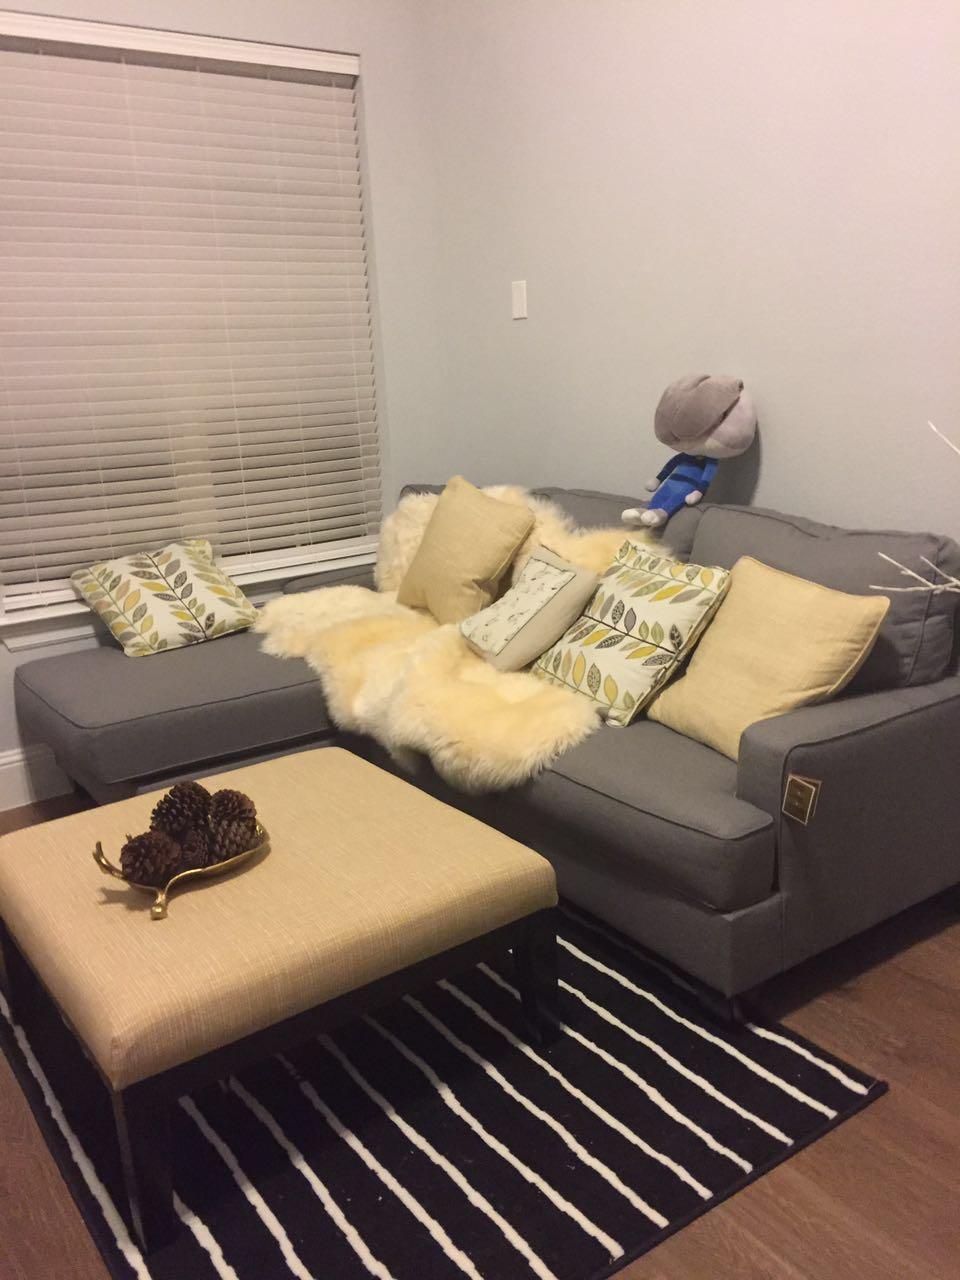 Plano新房分租, 主卧大小,拎包入住$600